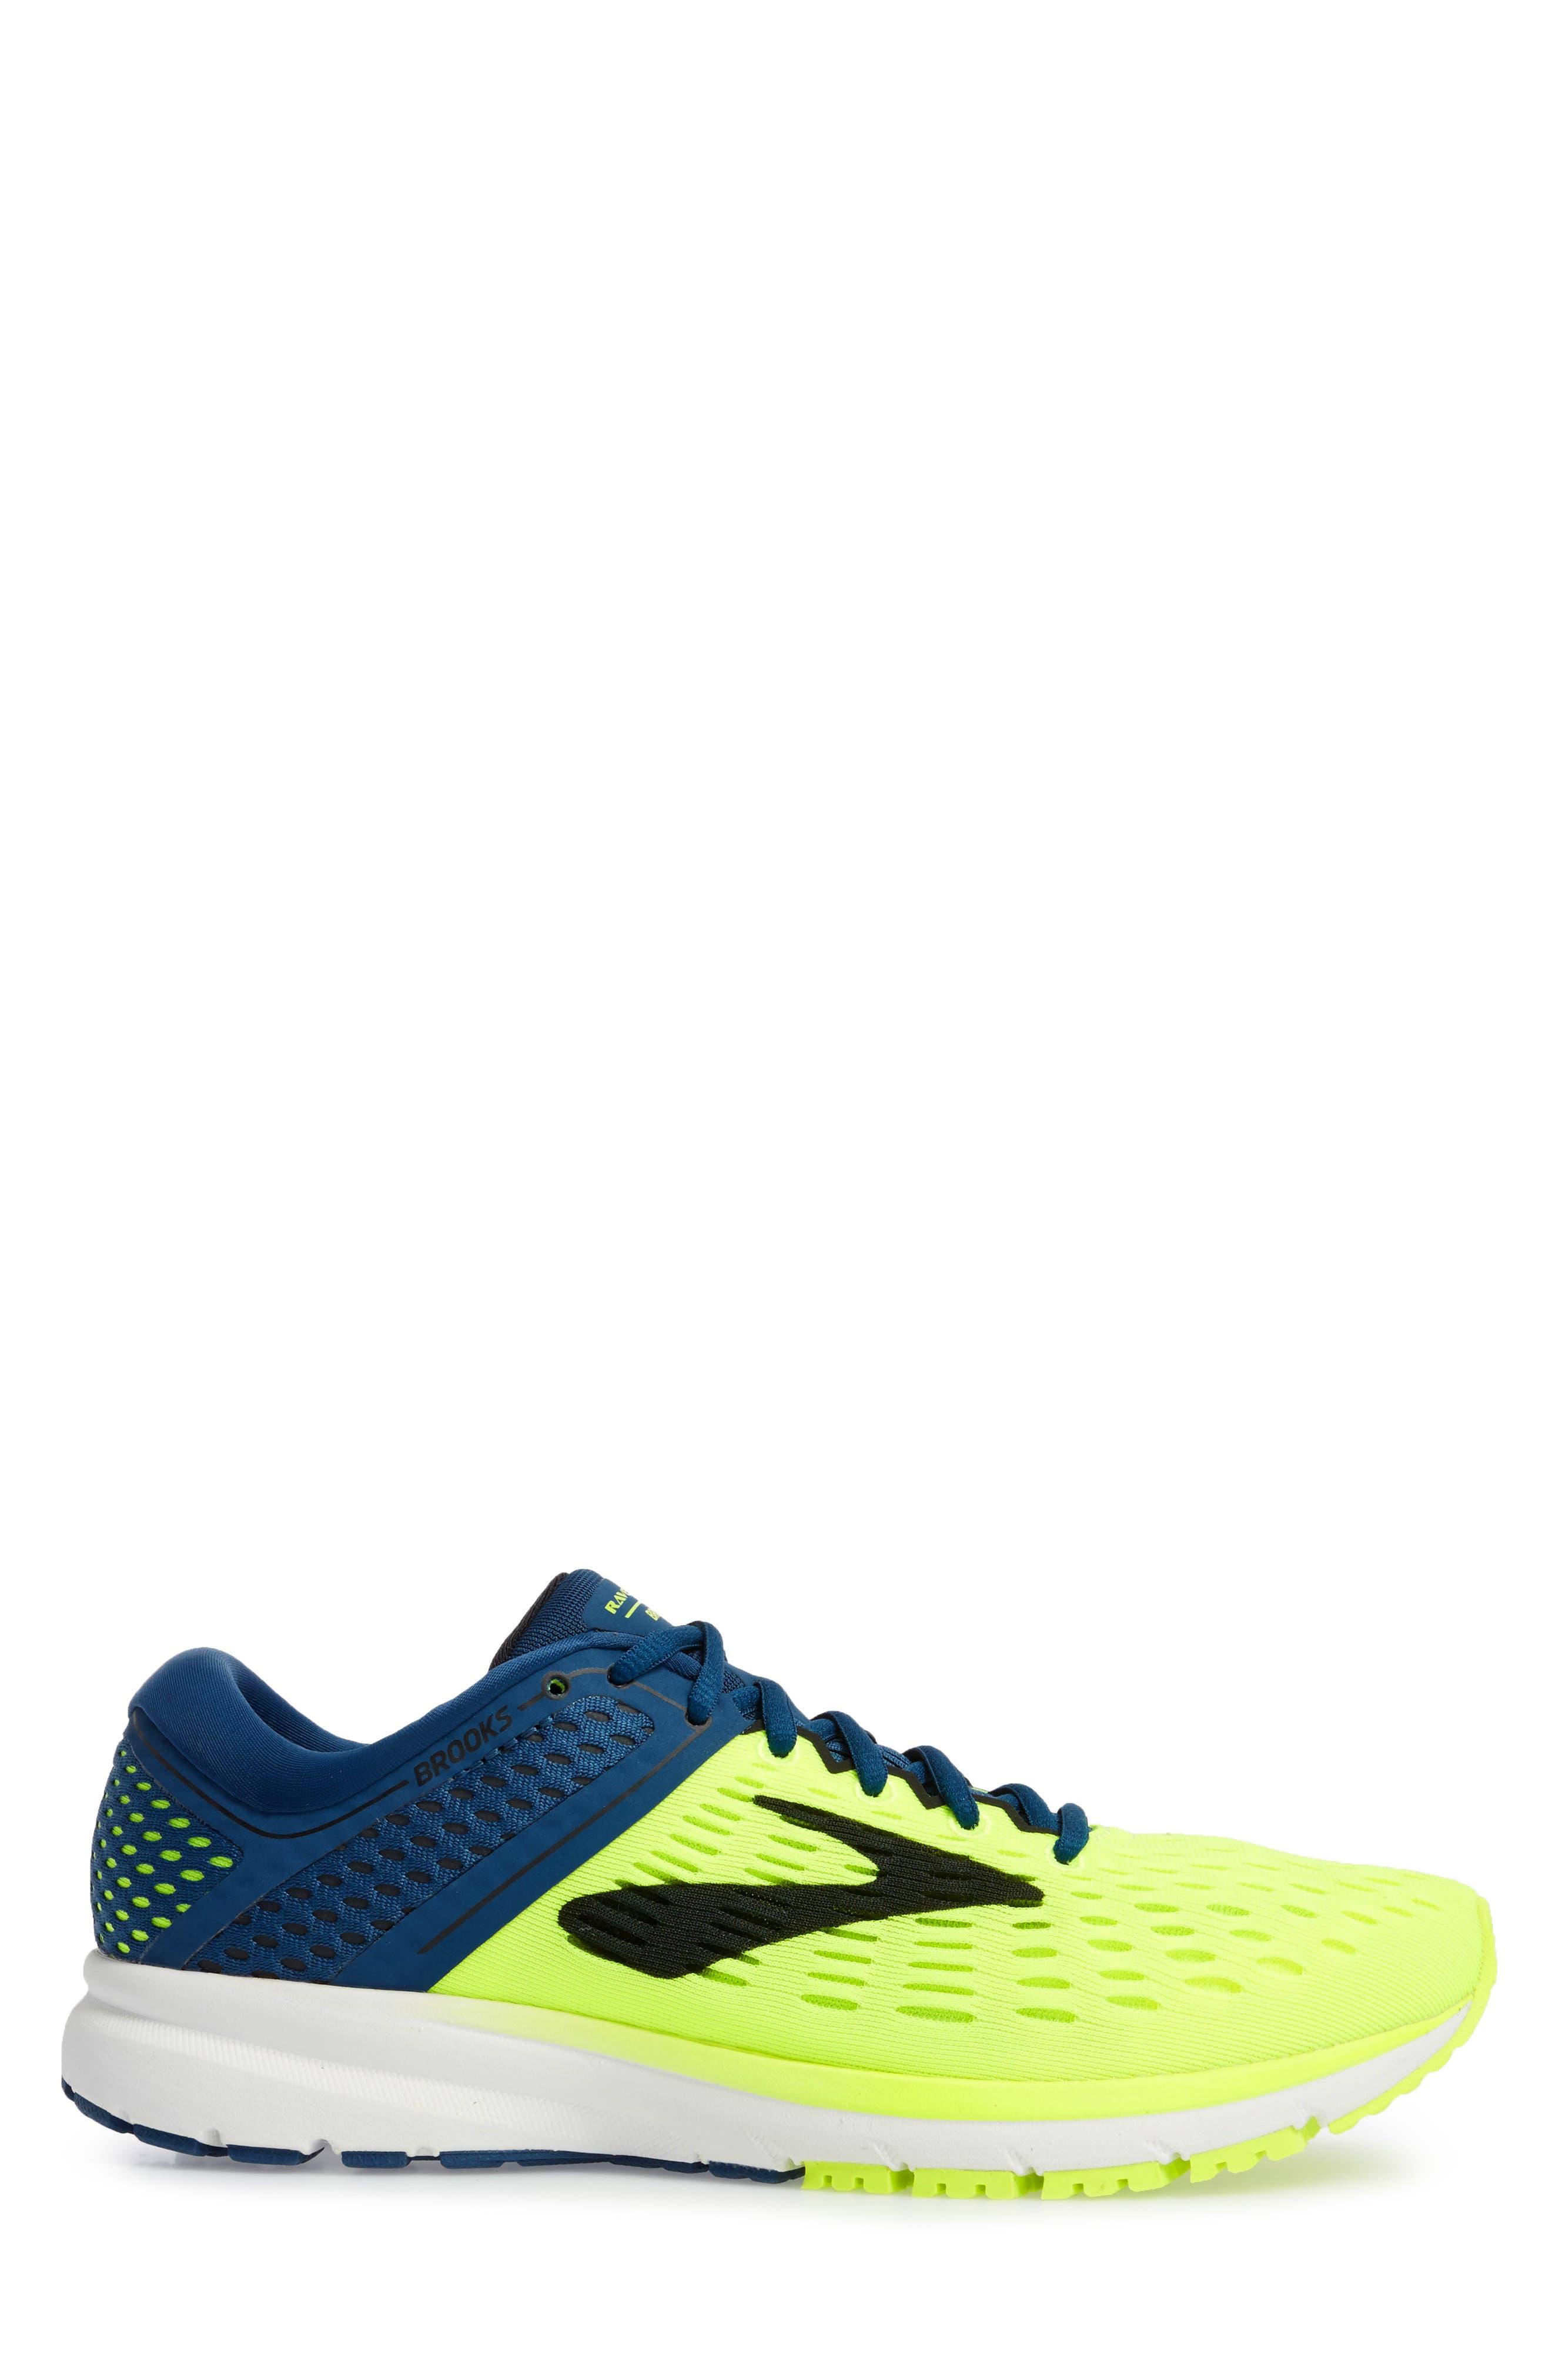 Ravenna 9 Running Shoe,                             Alternate thumbnail 3, color,                             Nightlife/ Blue/ Black